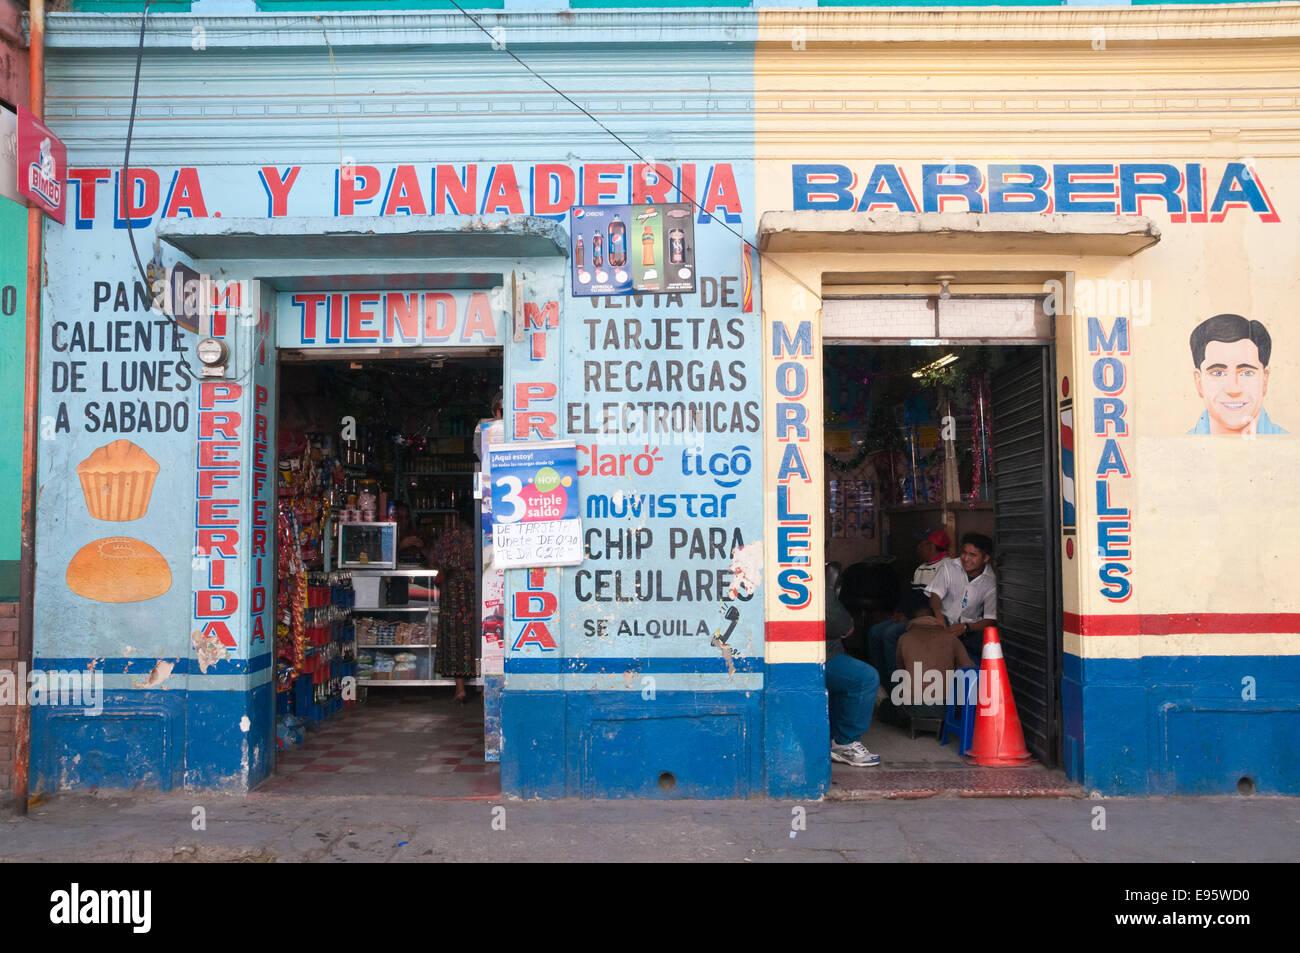 Barber (Barberia) and Bakery (Panaderia), Solola, Guatemala - Stock Image